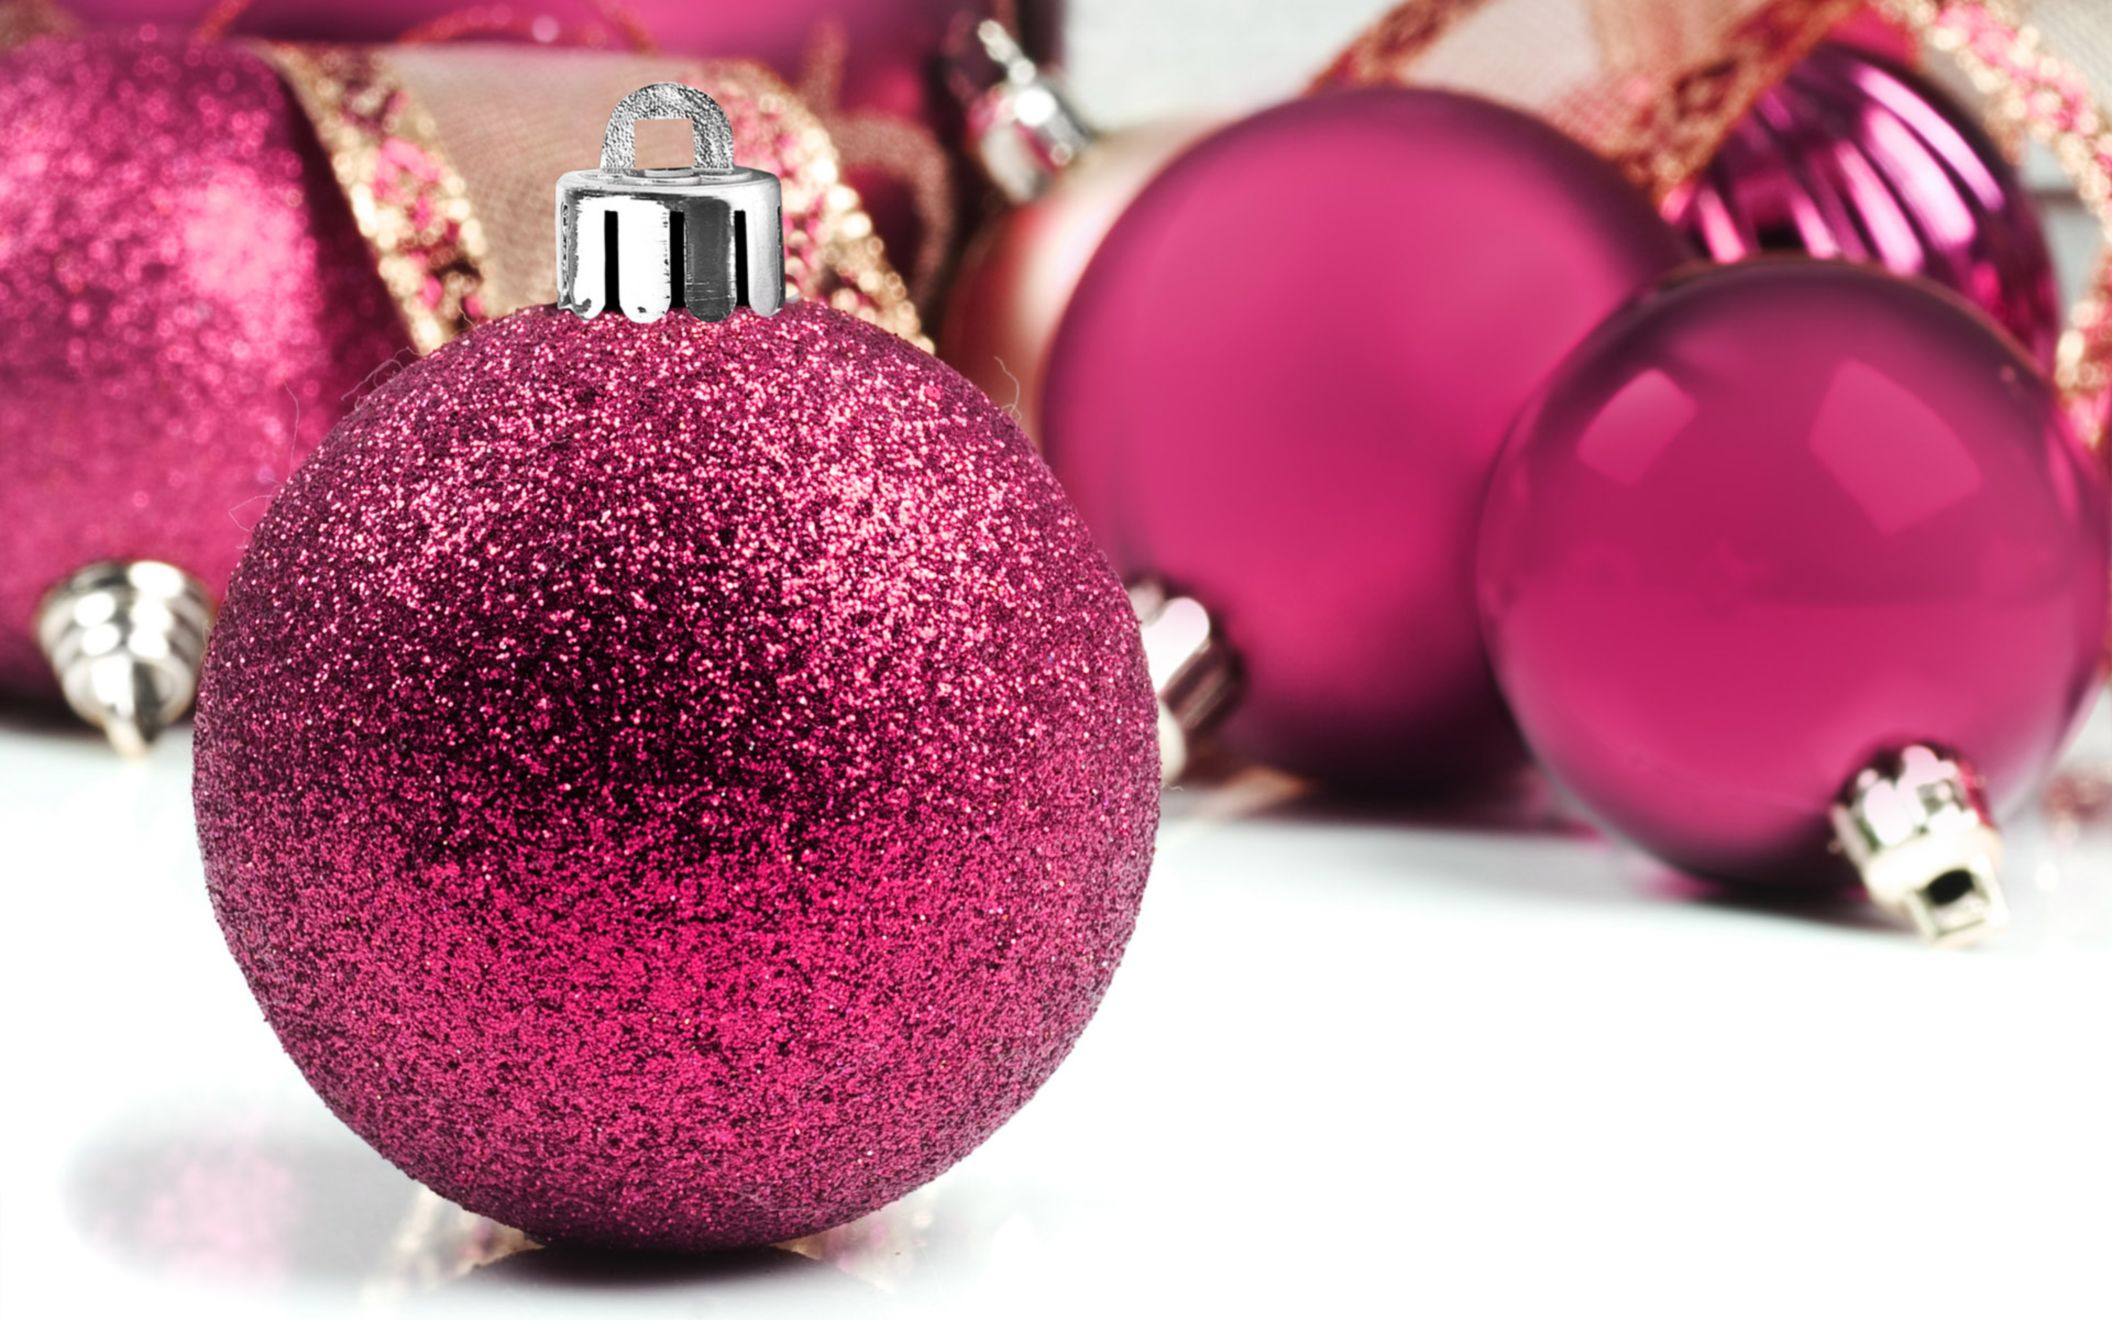 Download Free Hd Pink Christmas Tree Wallpaper, Image - Pink Christmas Ornaments - HD Wallpaper